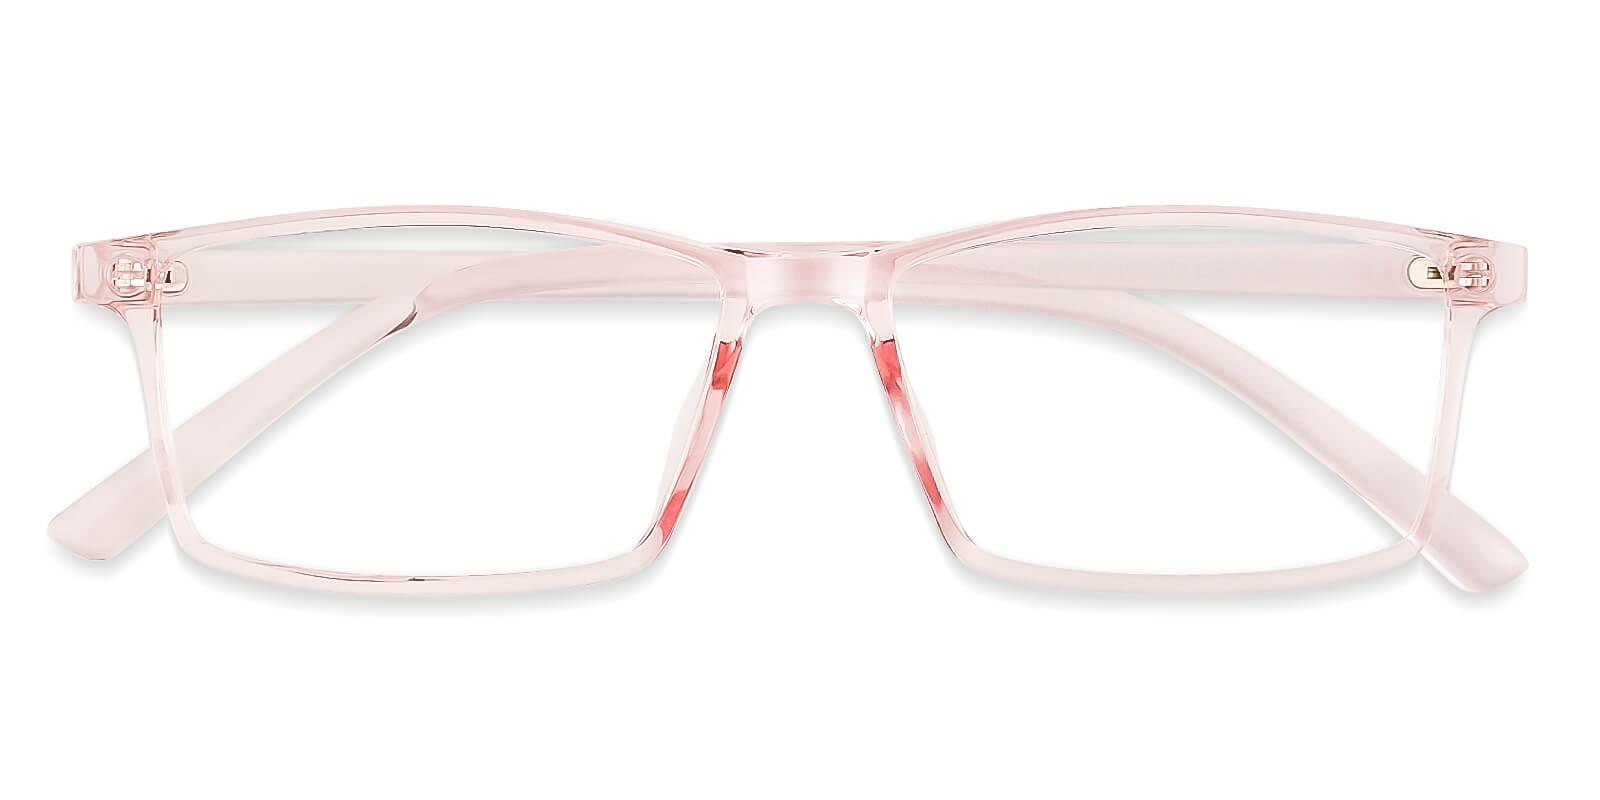 Eliana Pink TR Lightweight , UniversalBridgeFit , Eyeglasses Frames from ABBE Glasses